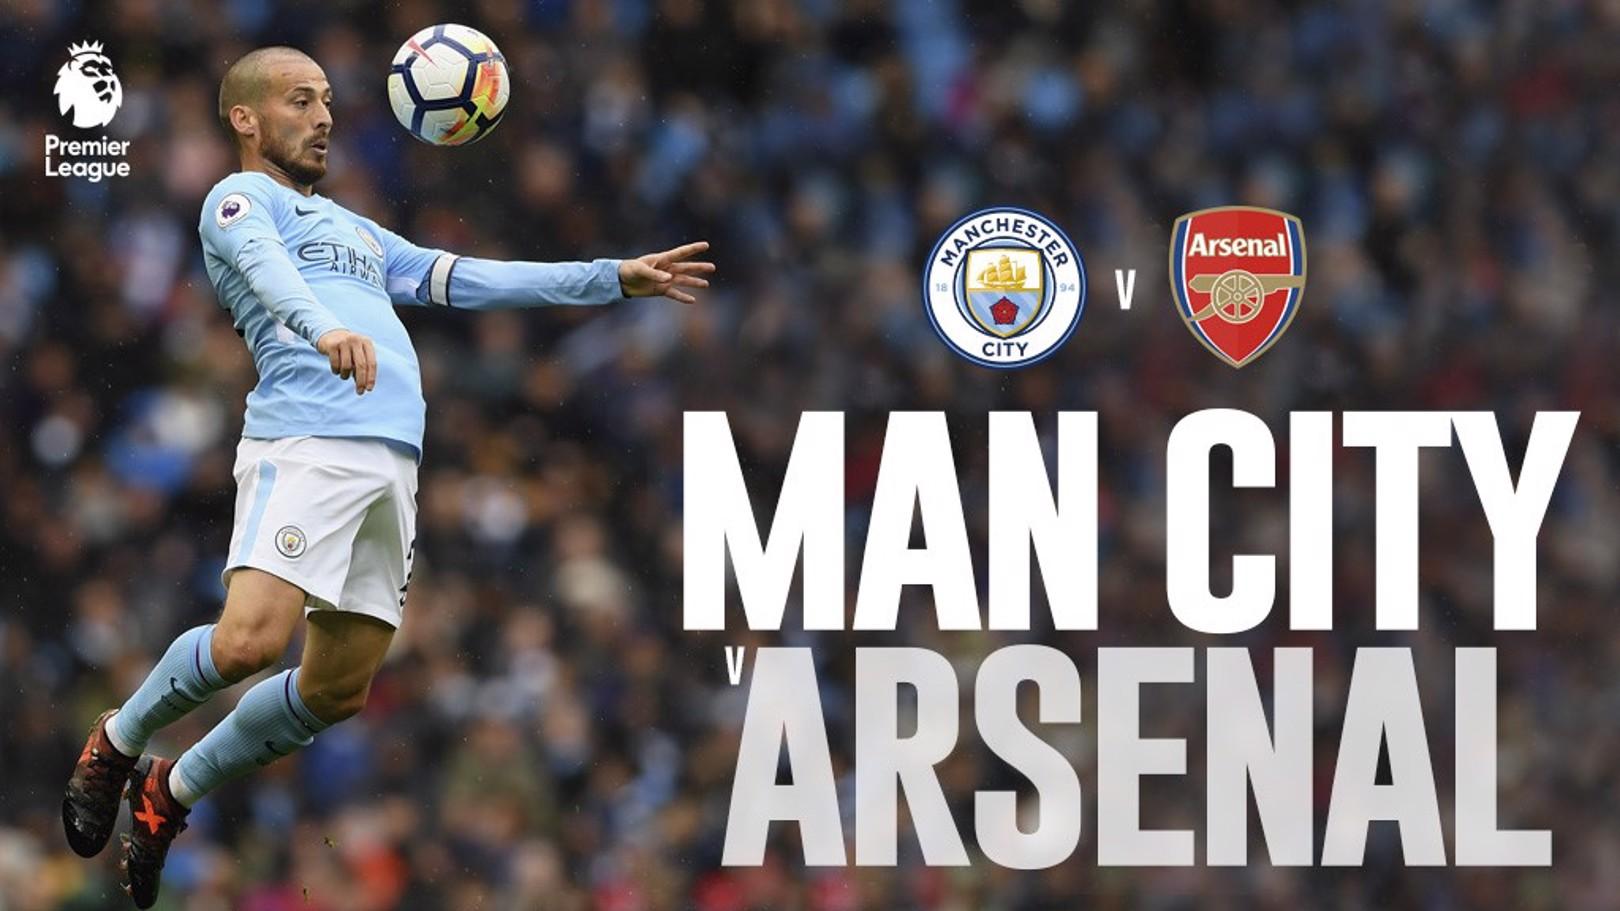 Manchester City - Arsenal.